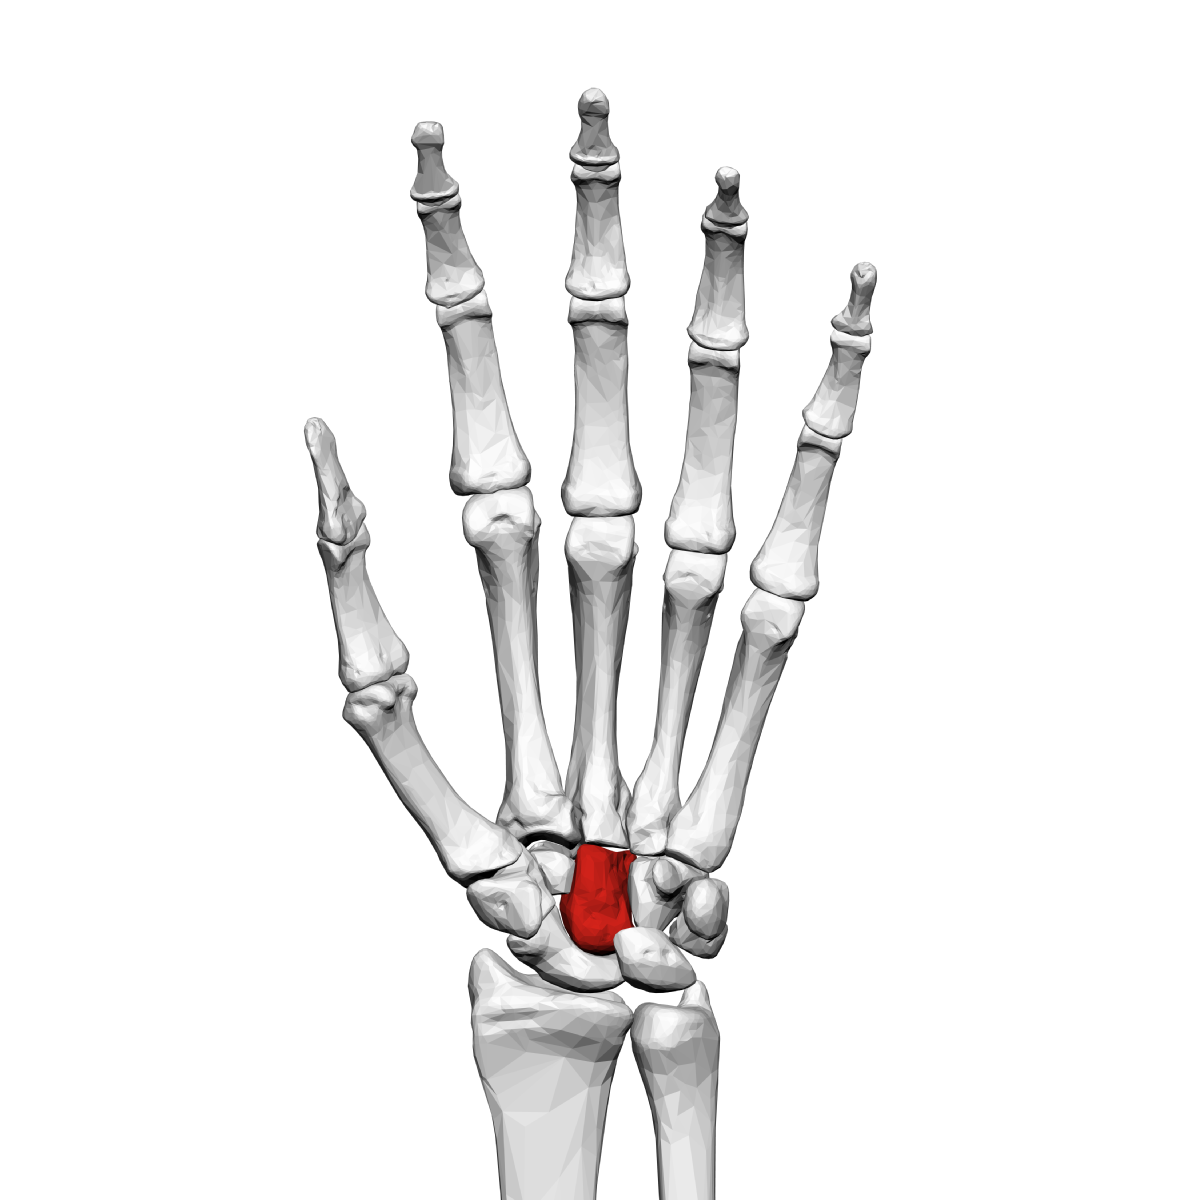 Capitate bone - Wikipedia